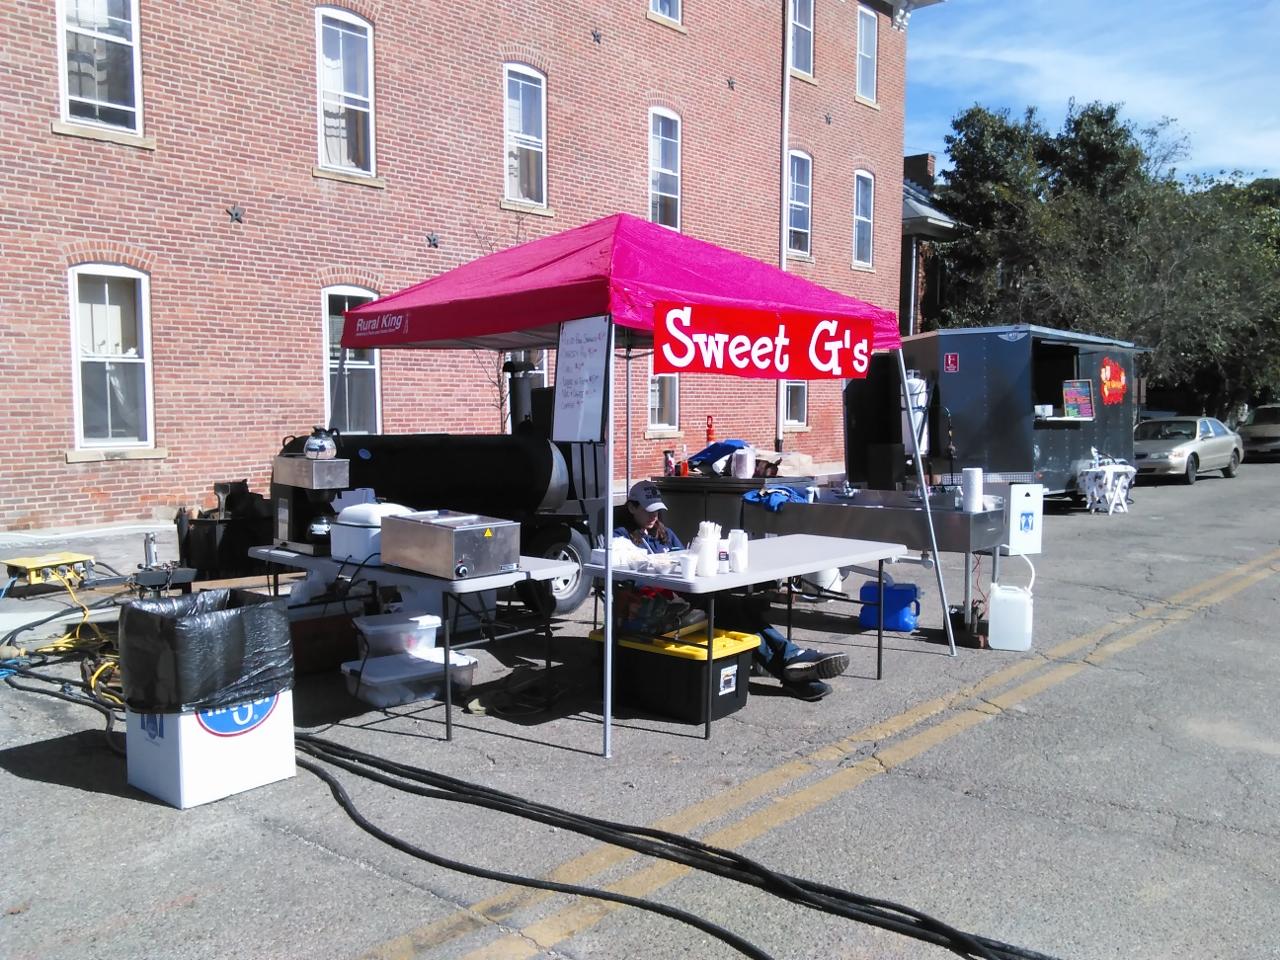 Ohio Smoked Meat Festival 2018 10-19-2018 12-39-36 PM